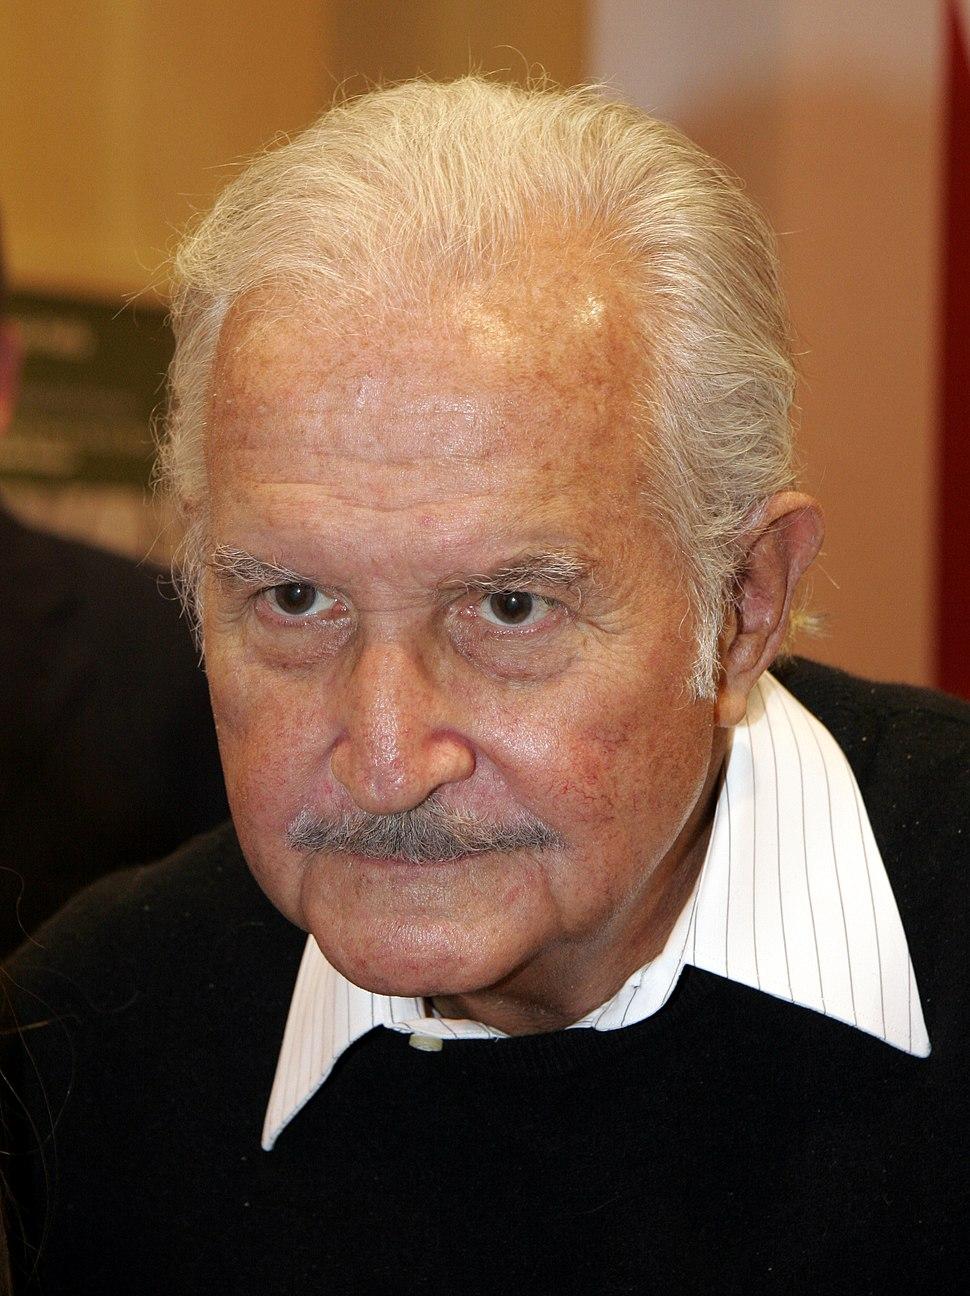 Fuentes in 2009